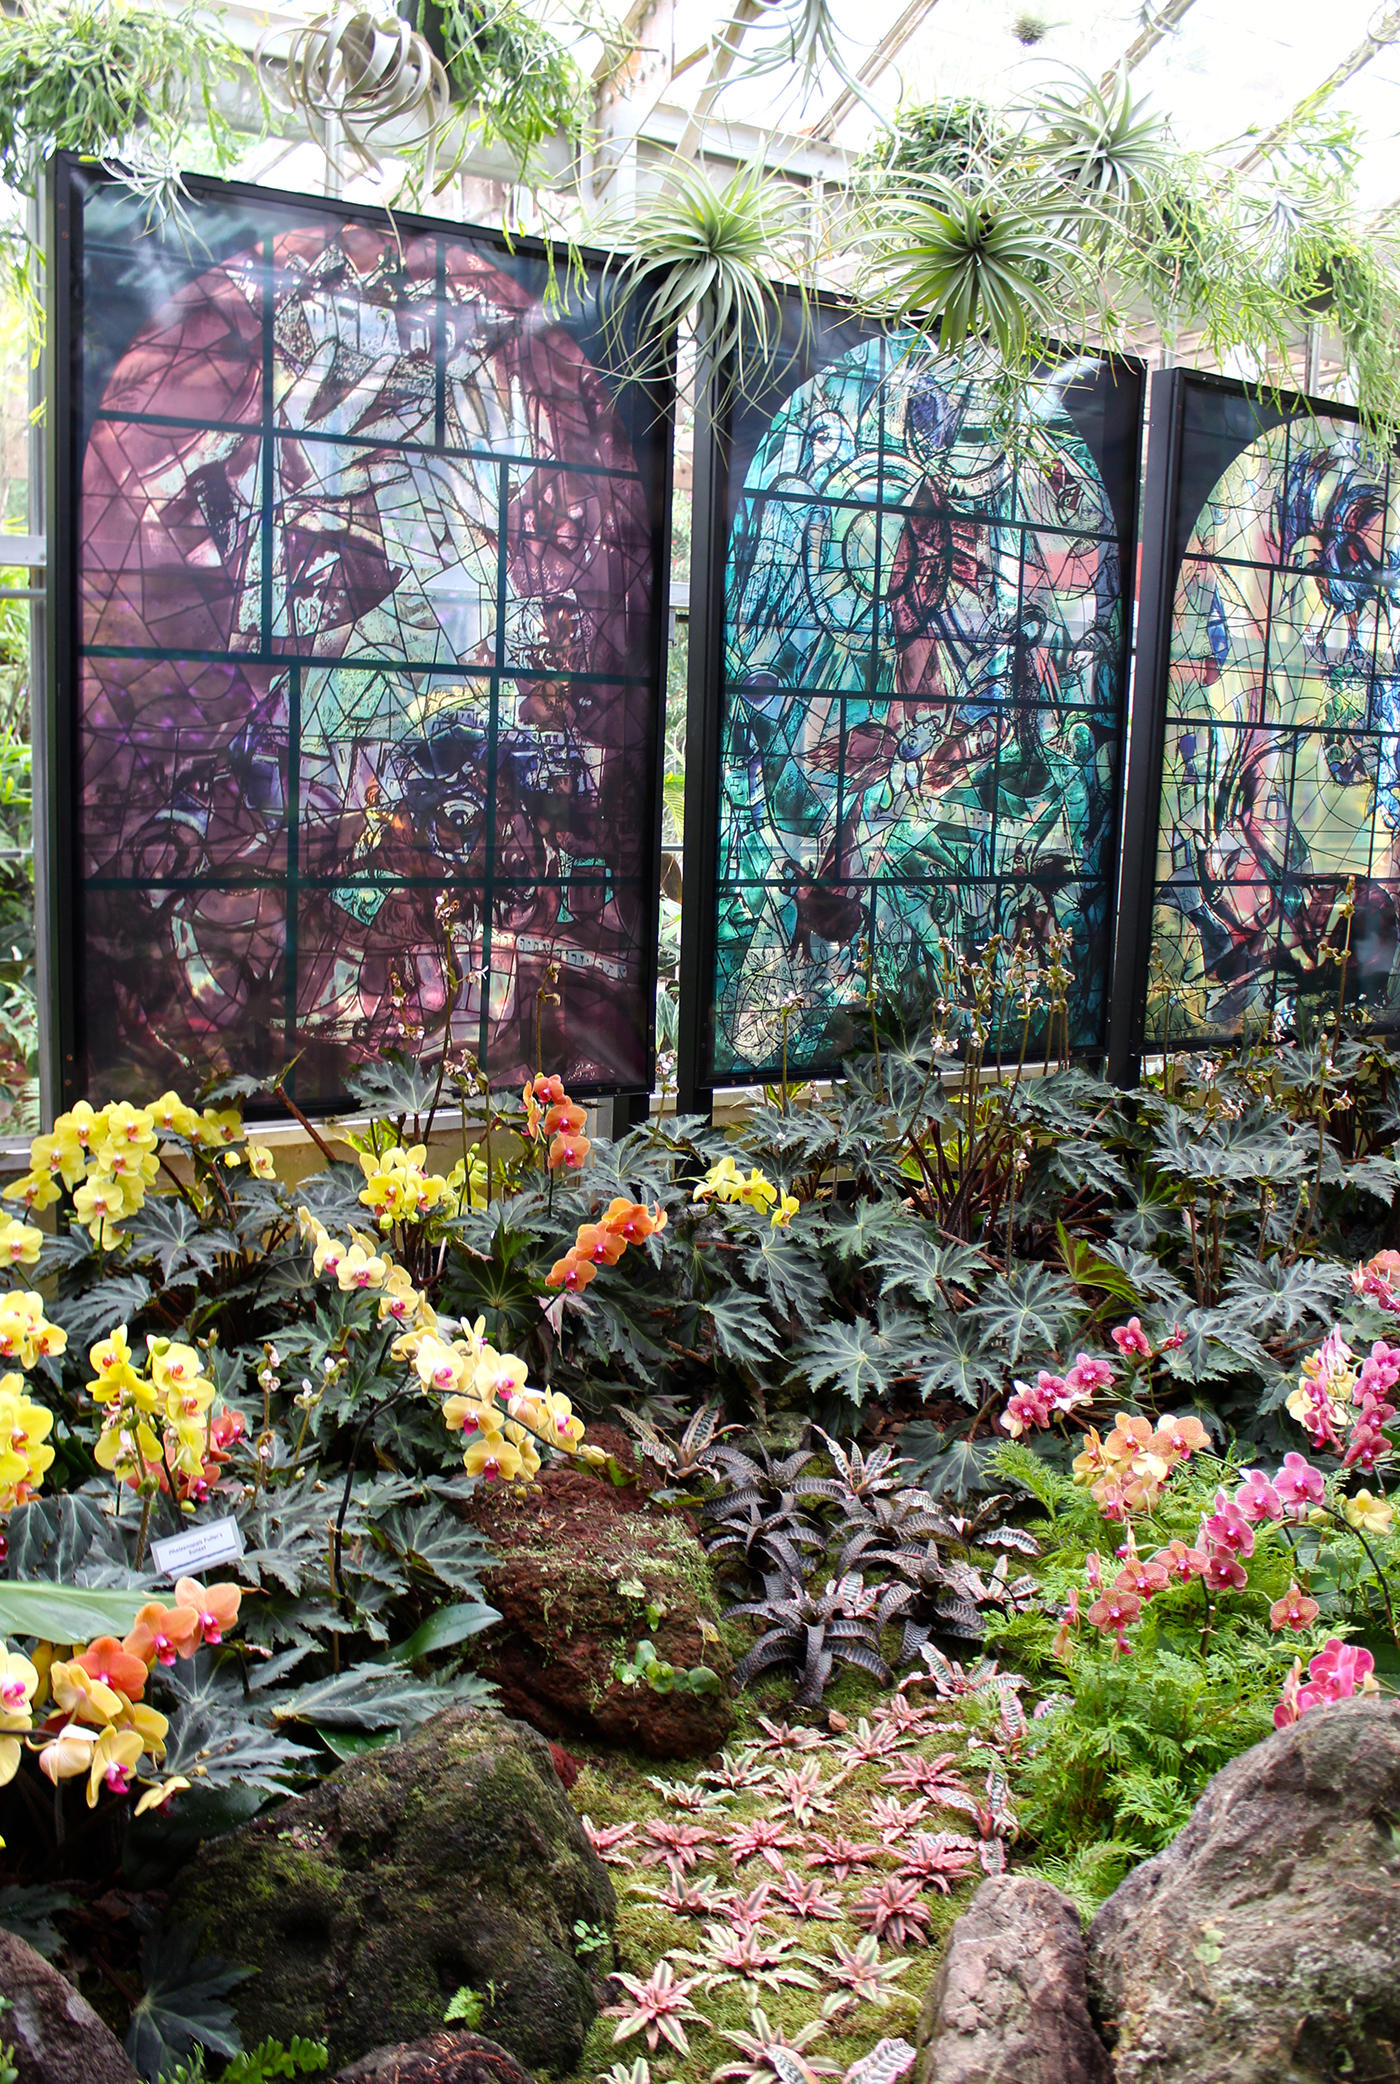 A Botanical Garden Blooms with Chagall Artes & contextos Selby3